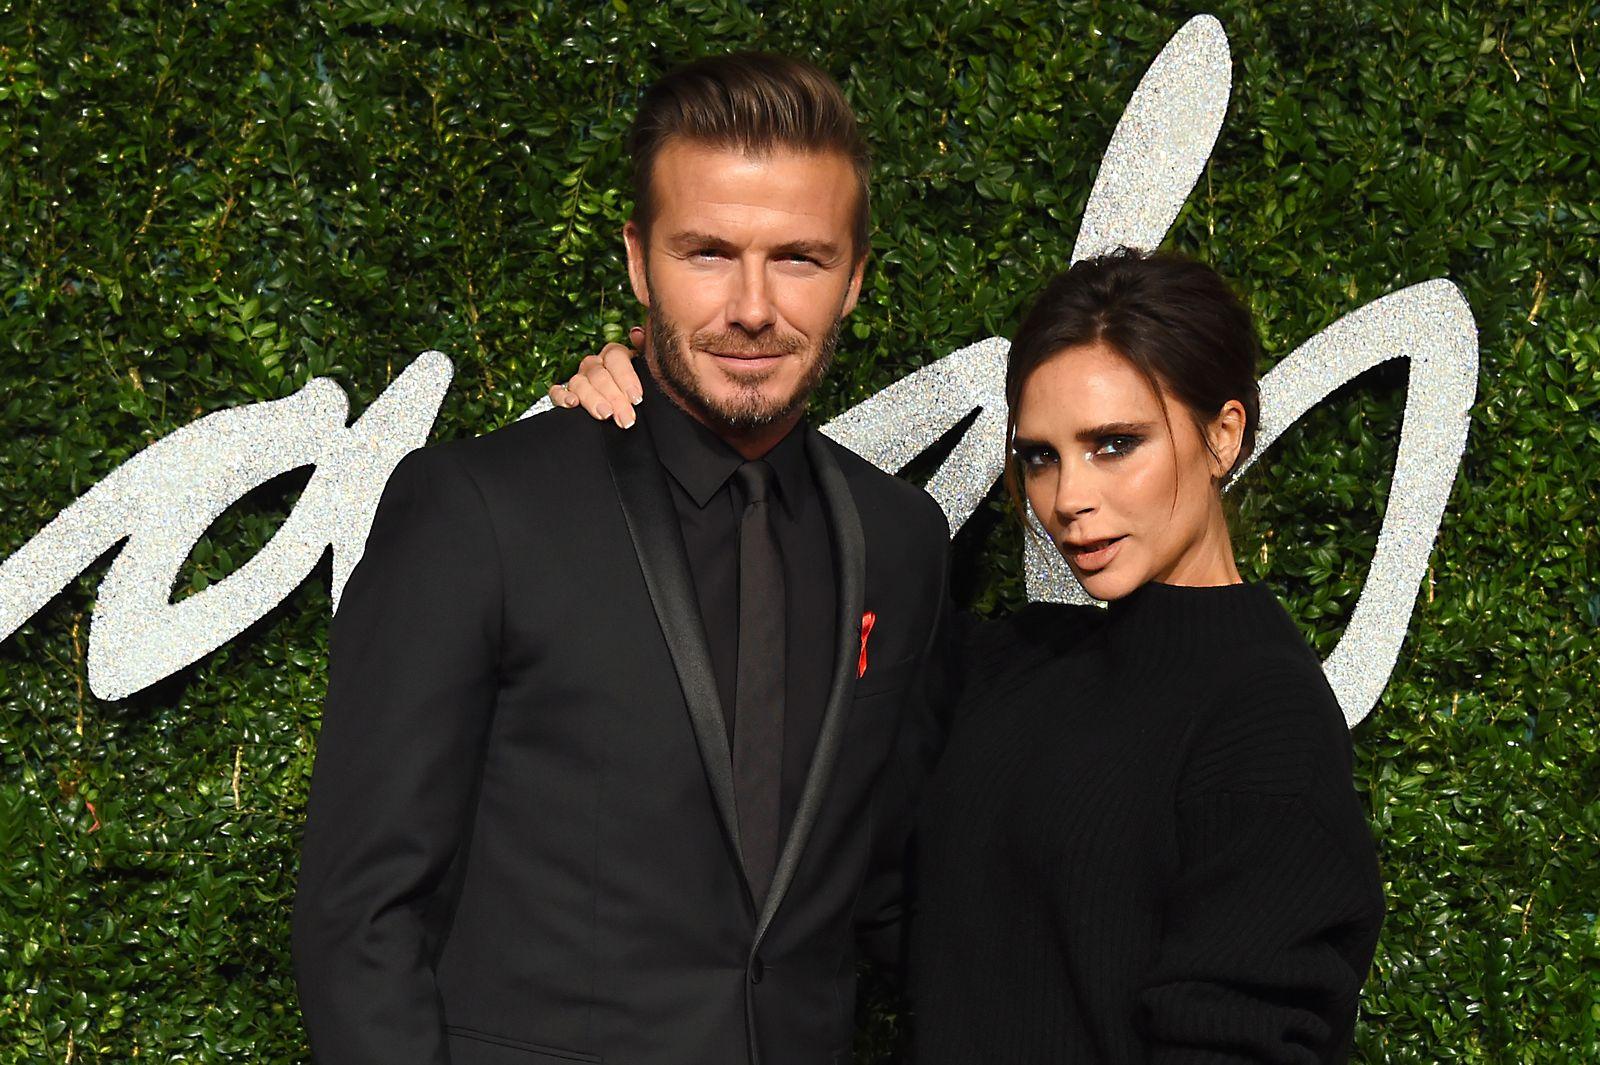 David Beckham/ Victoria Beckham